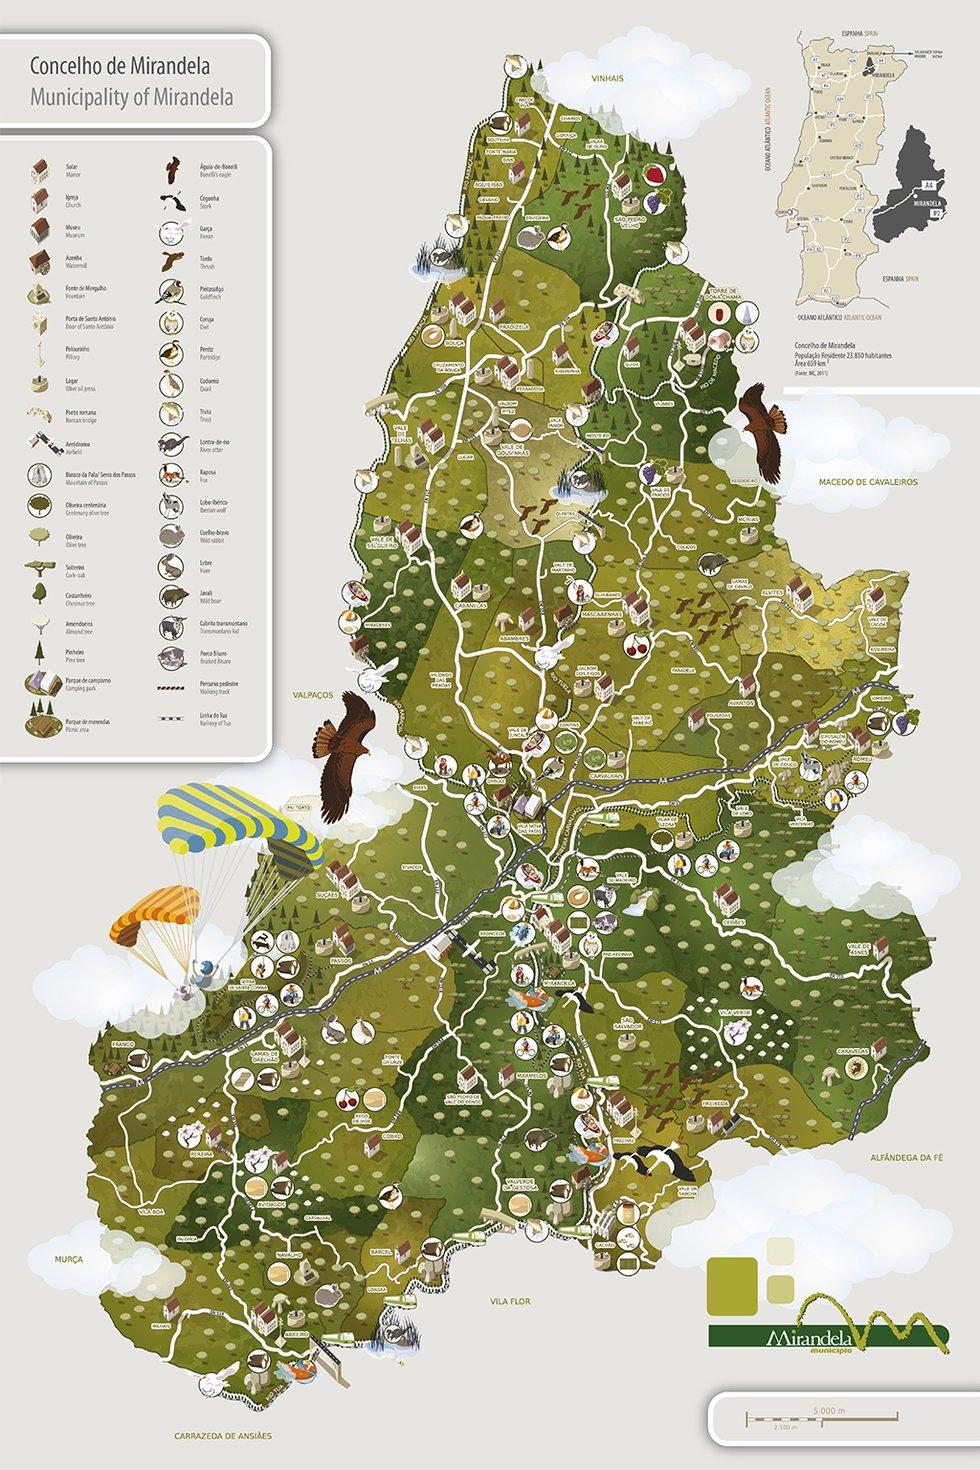 Mirandela Turismo Mapa Do Concelho